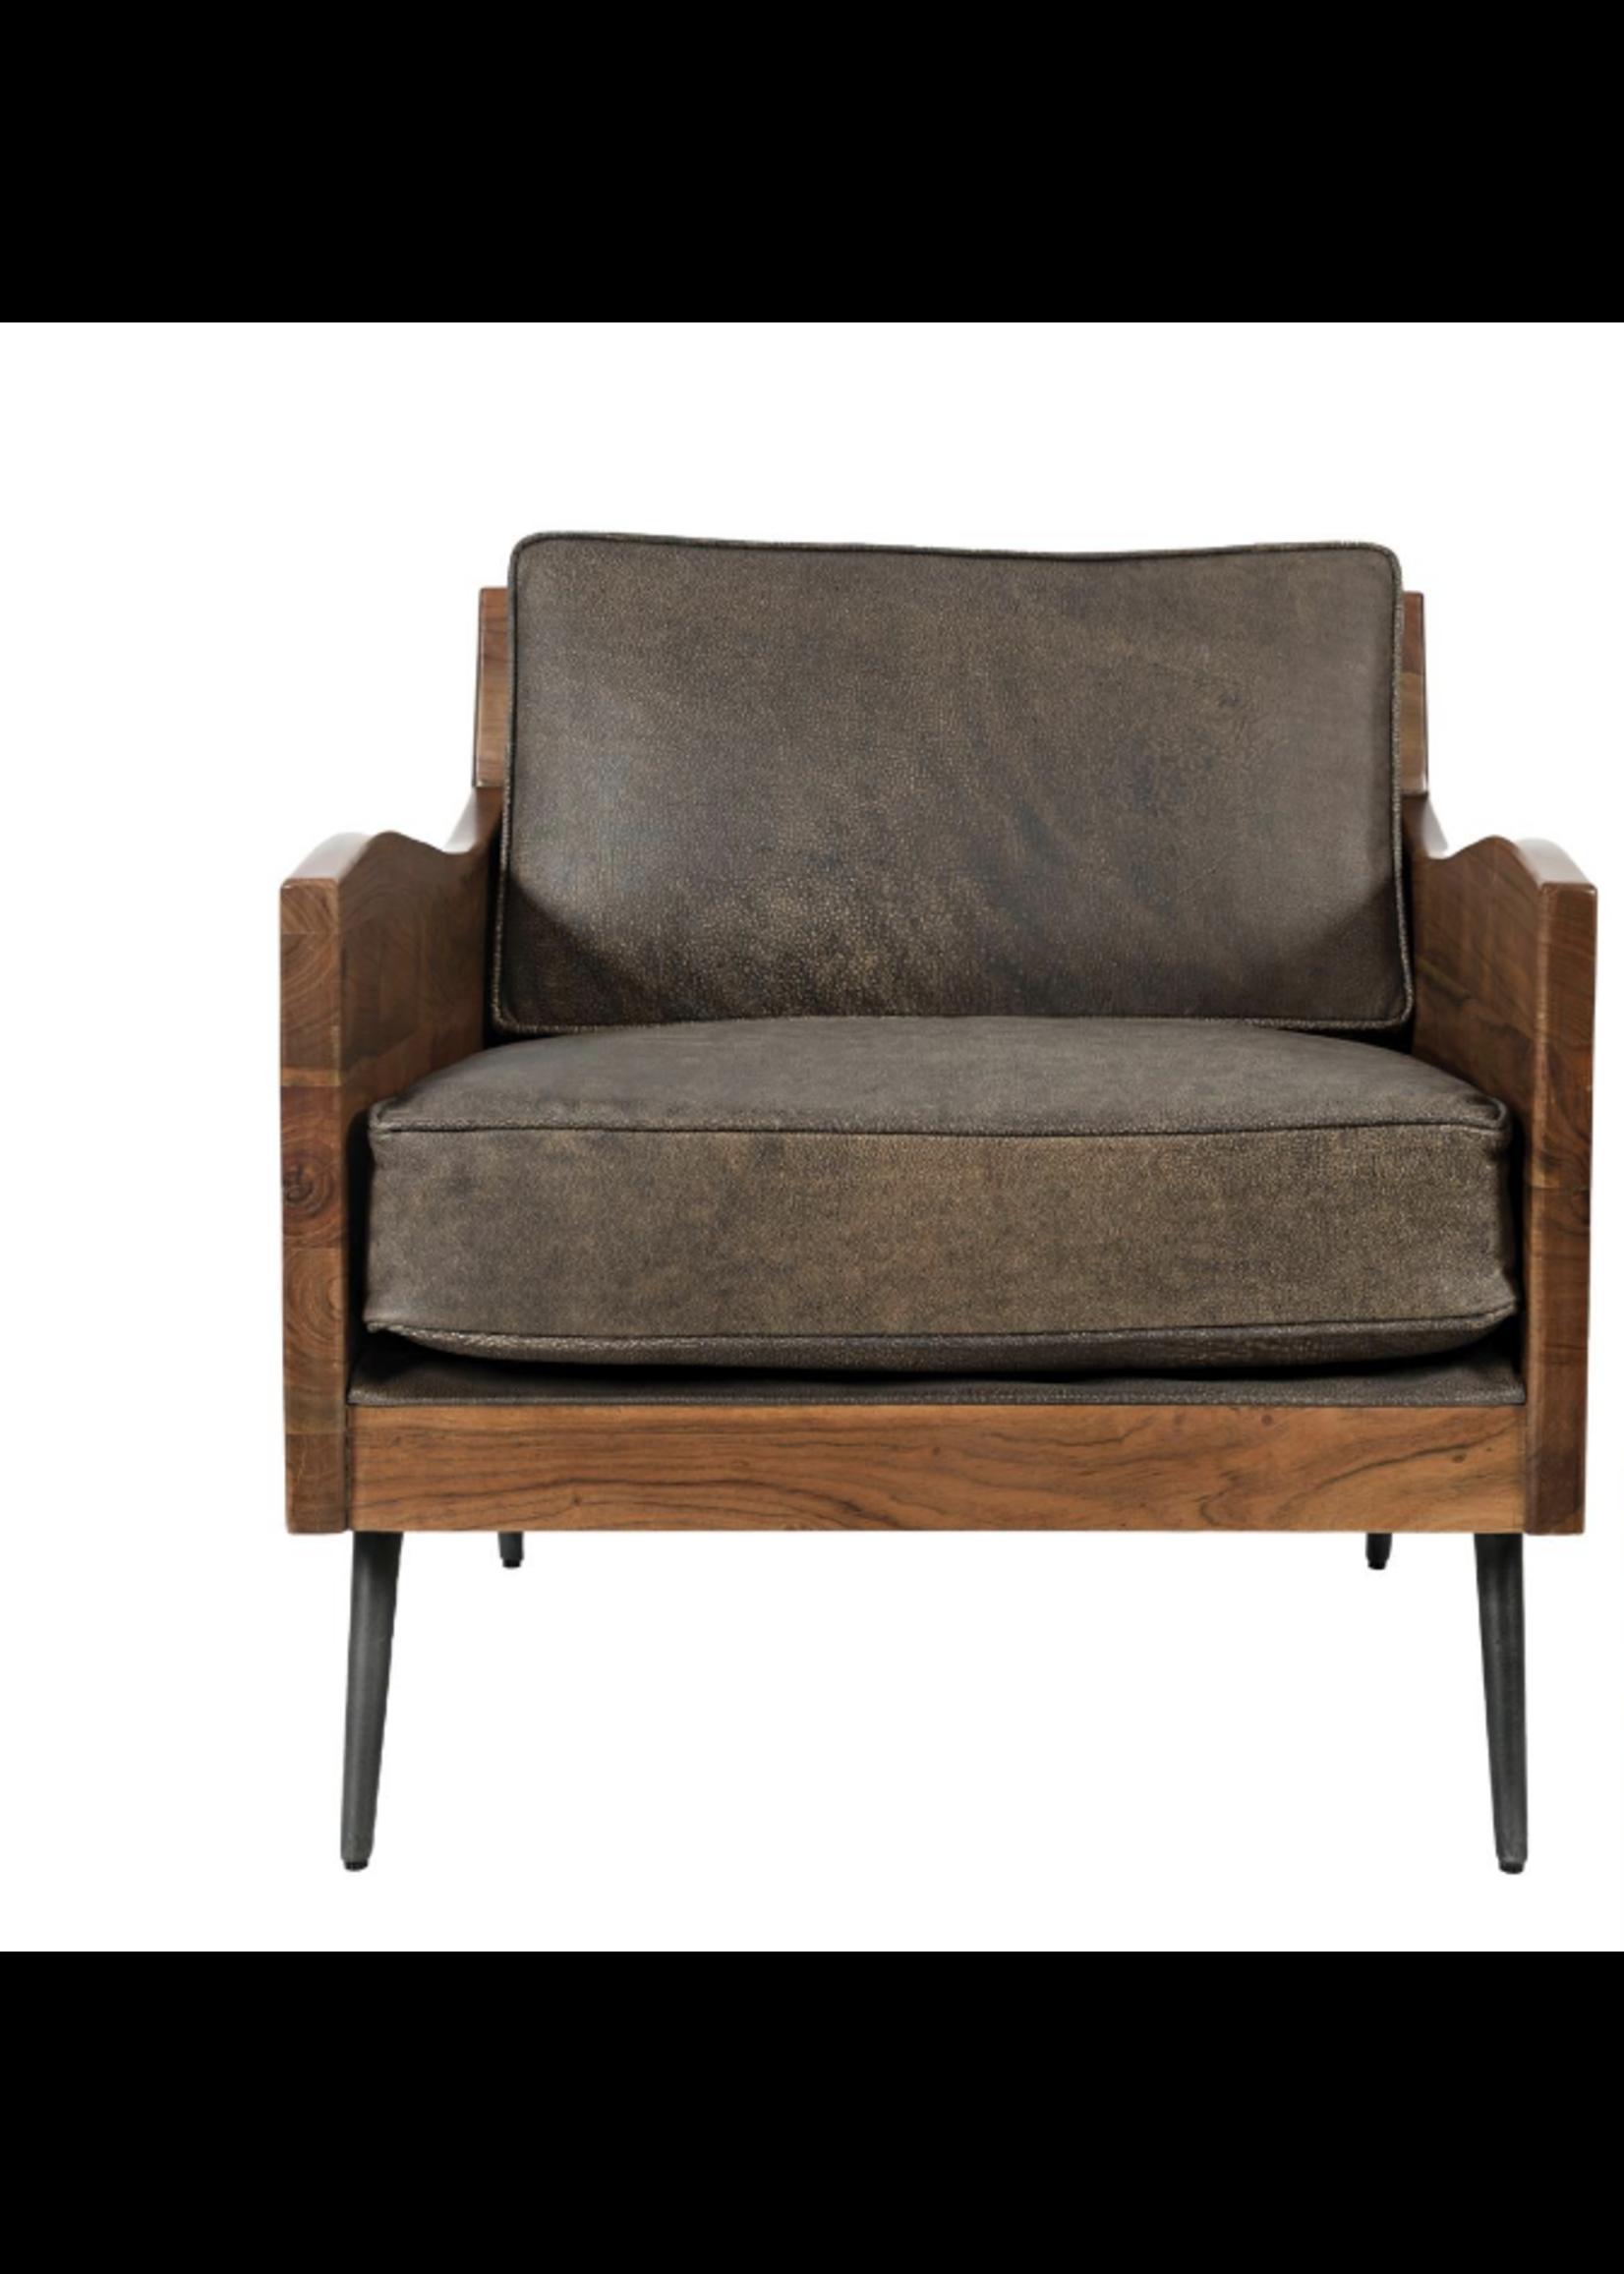 New Karma Accent Chair-Bourbon JO